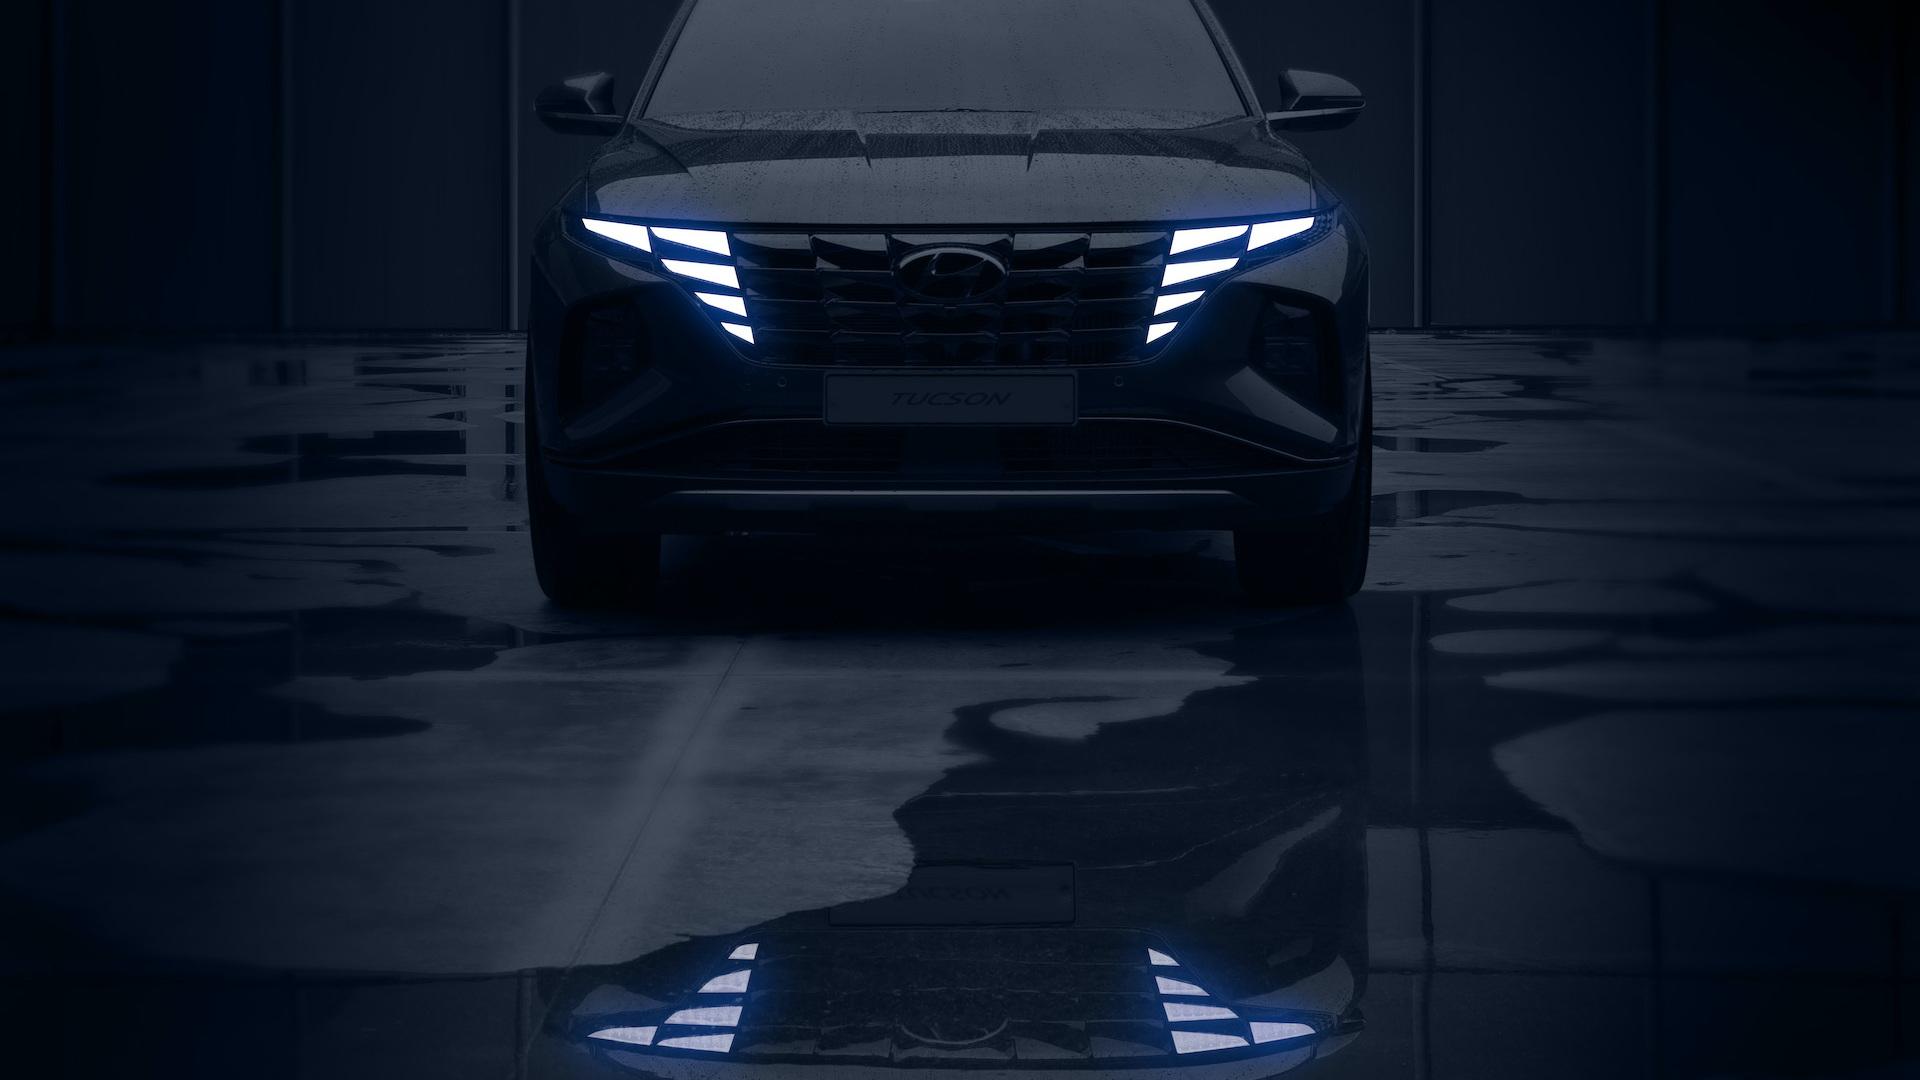 2022 Hyundai Tucson teasers